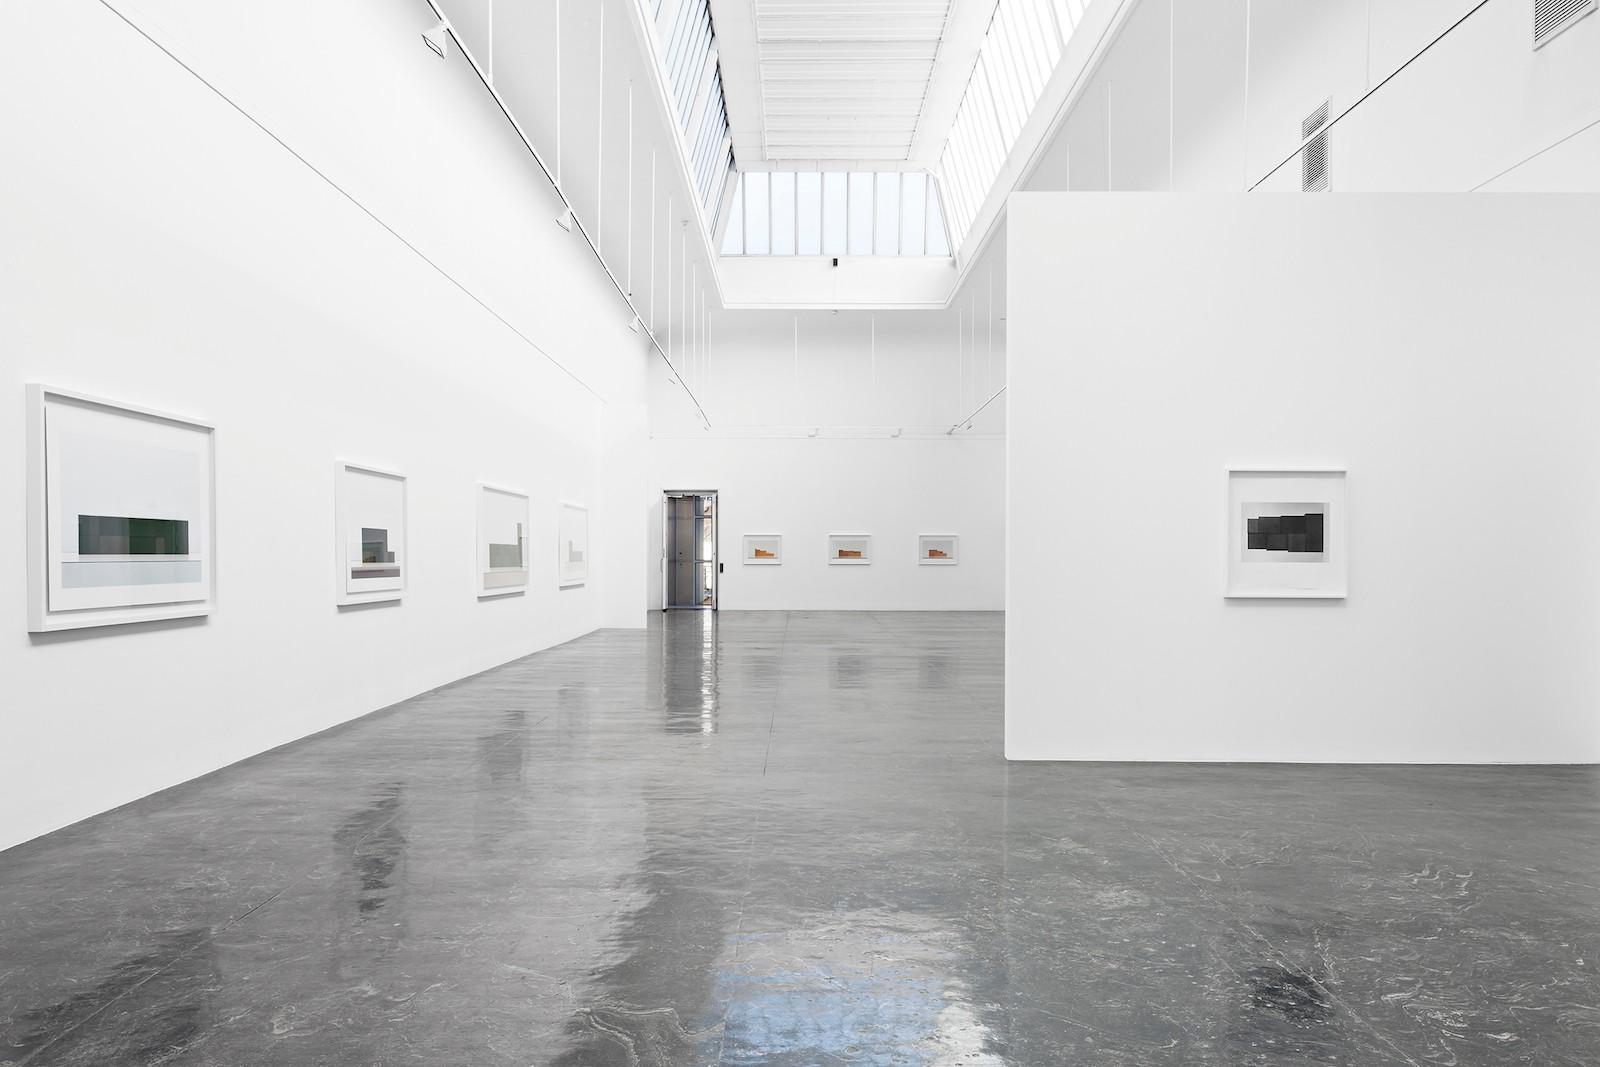 Installation view Stein Rønning, Hierlieu, Kunstnernes Hus, Oslo, 2014